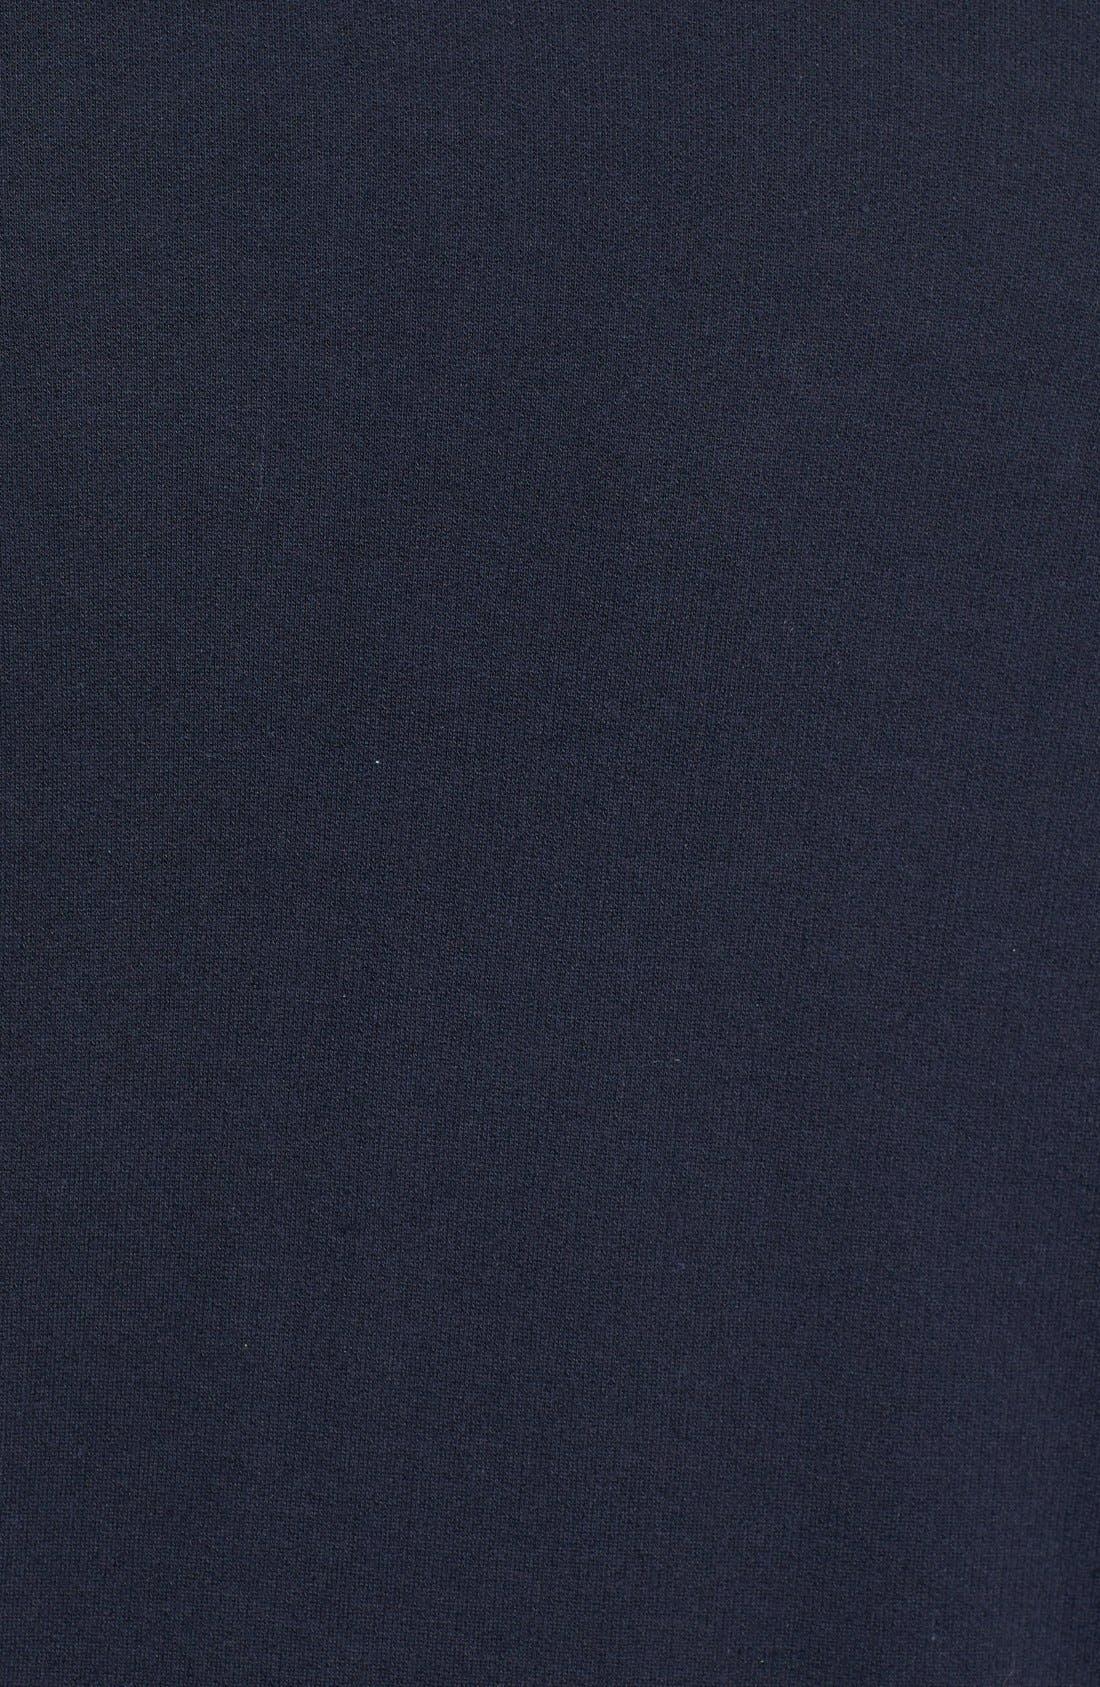 Alternate Image 3  - Daniel Buchler Pima Cotton & Modal Track Jacket